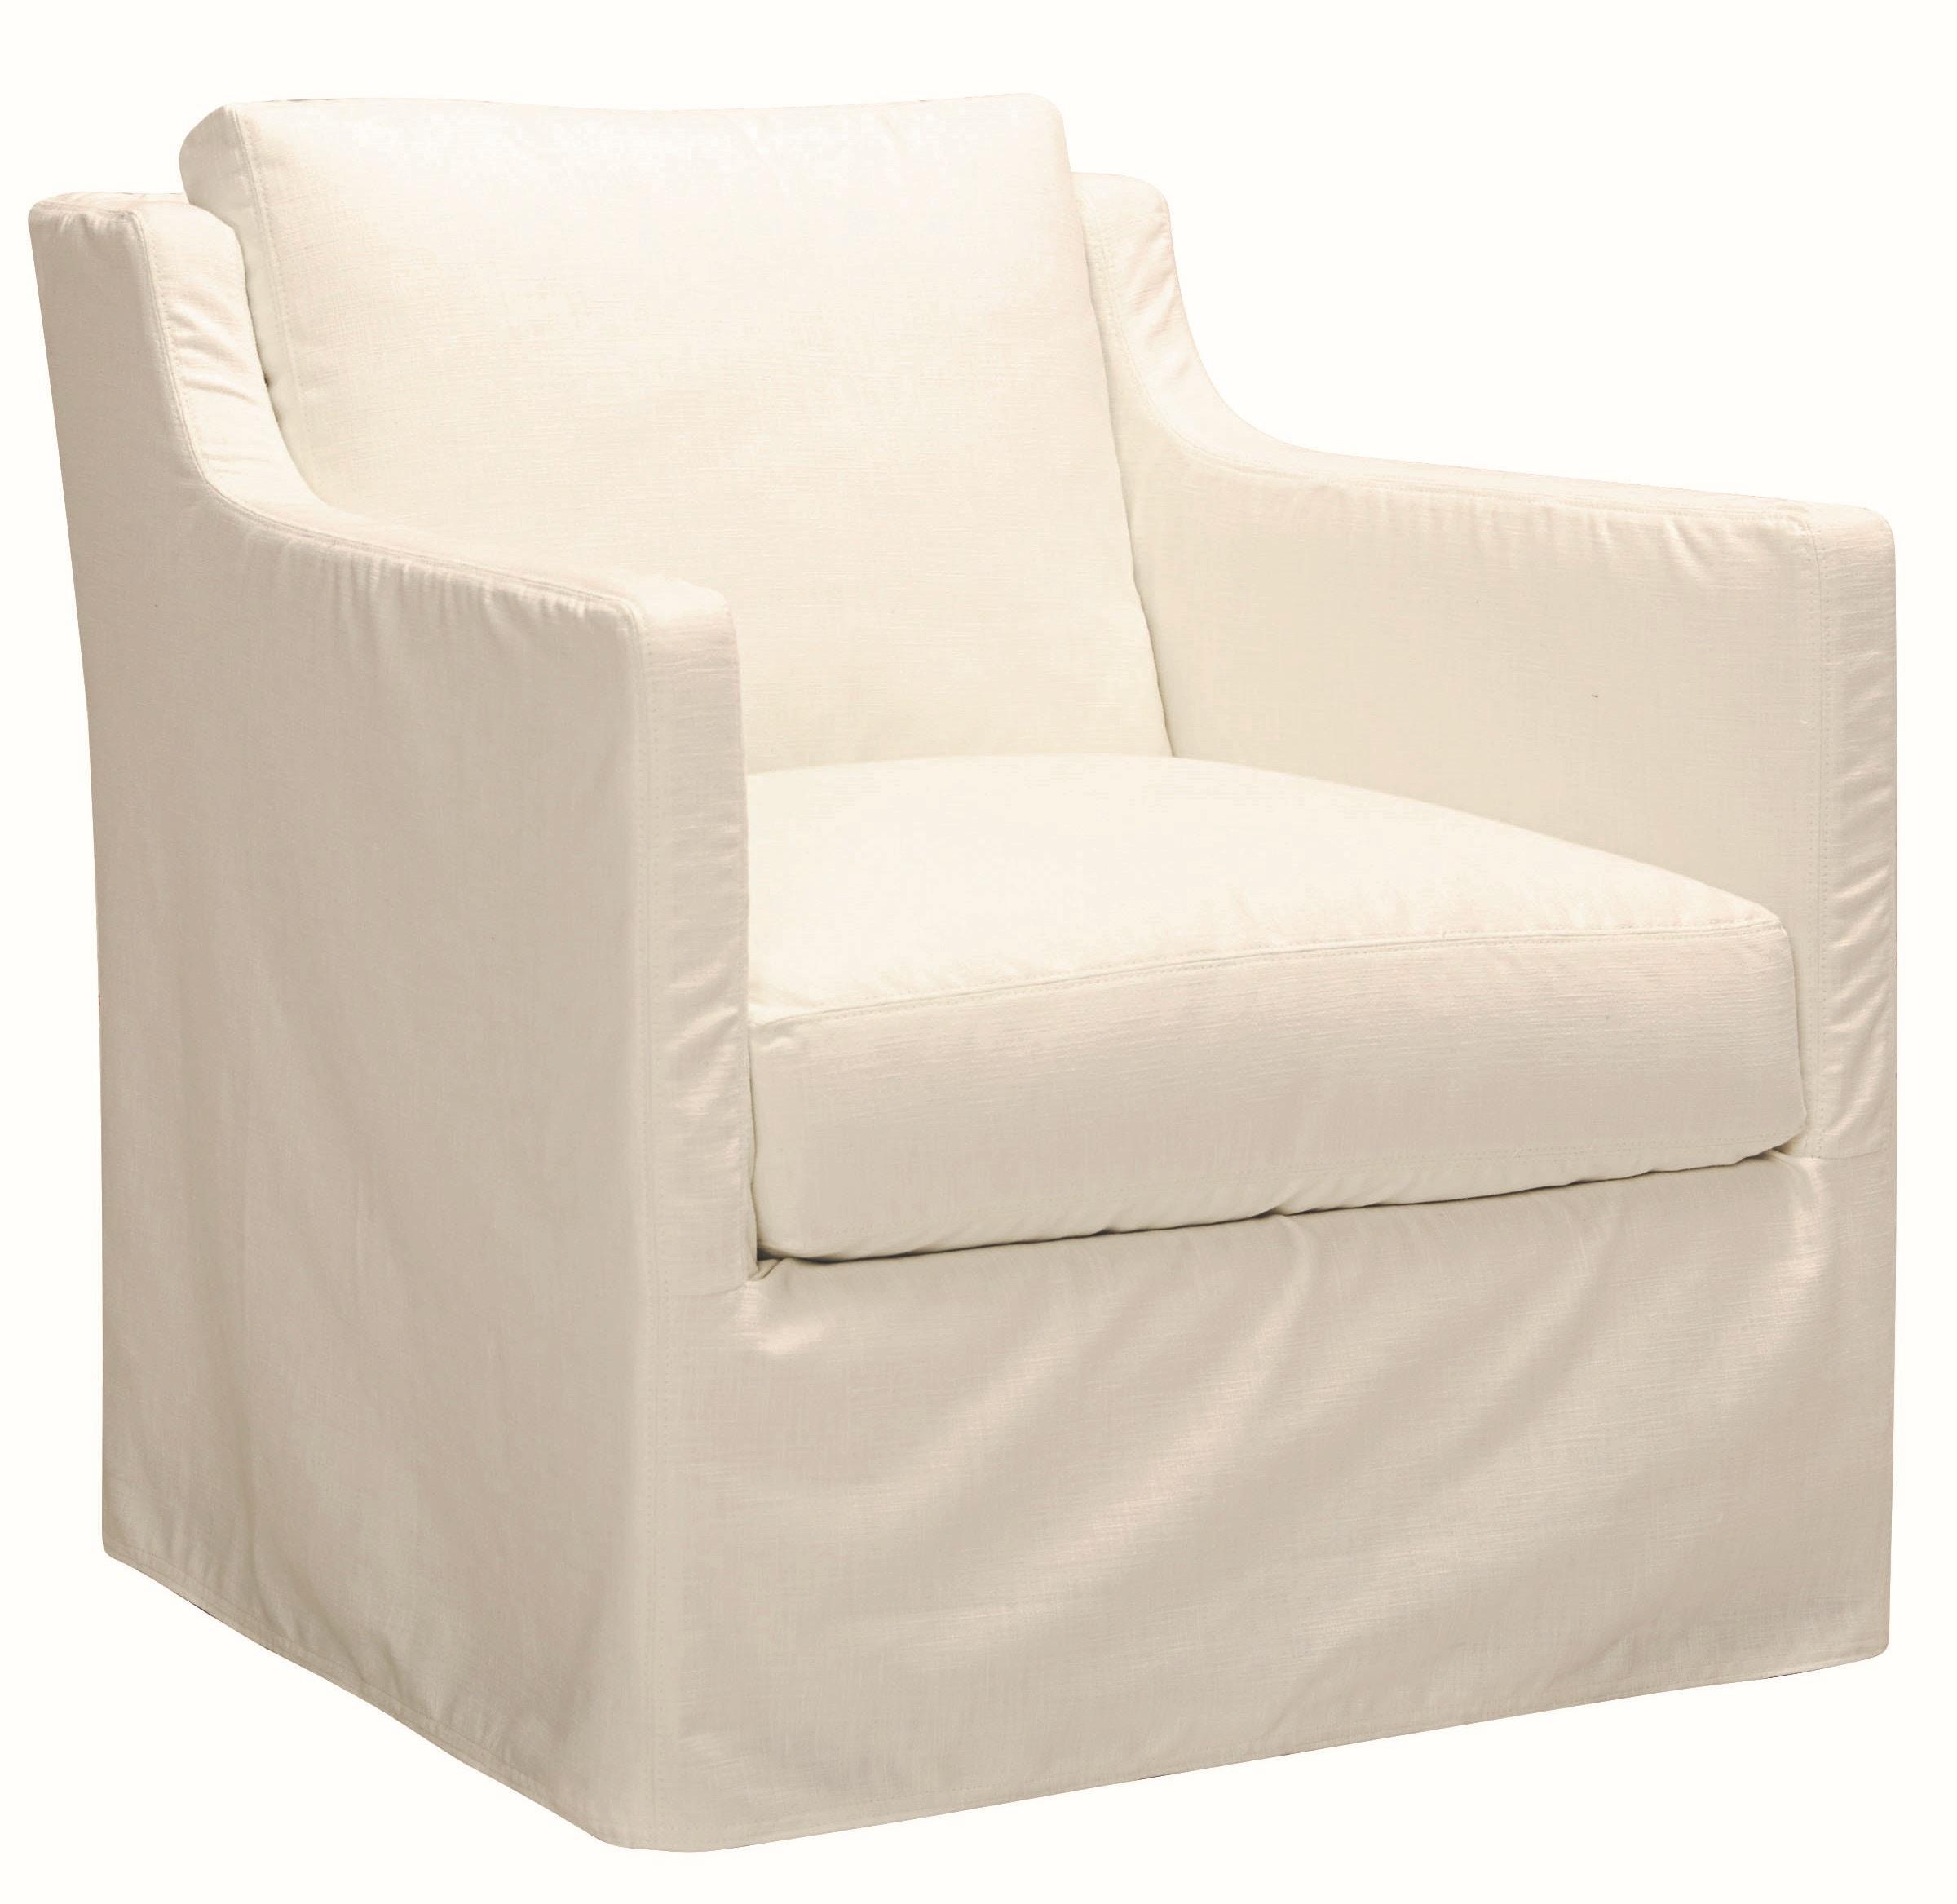 C1401 01. Slipcovered Chair. C1401 01. Lee Industries